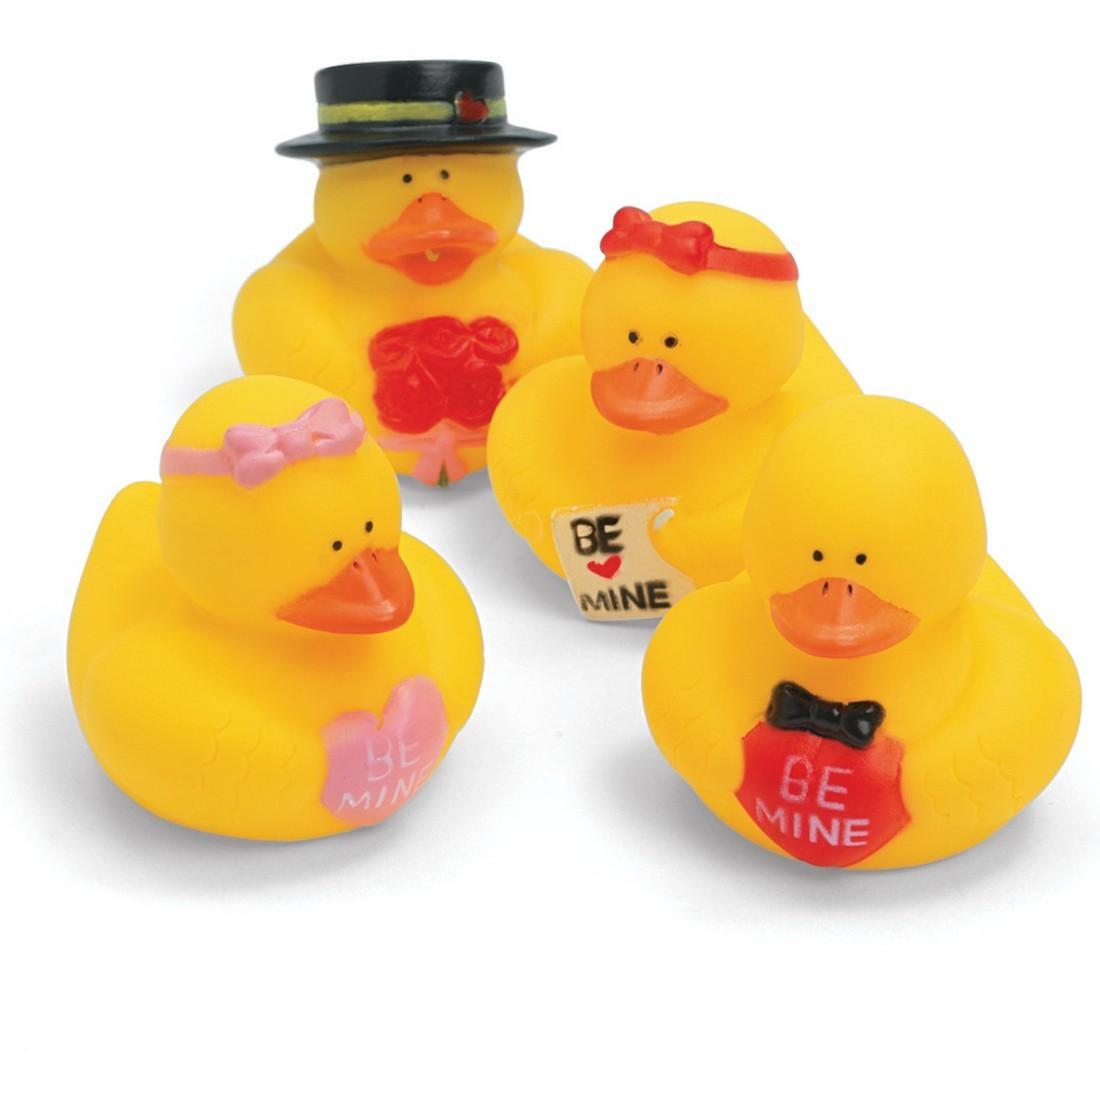 Valentine Rubber Ducks [image]